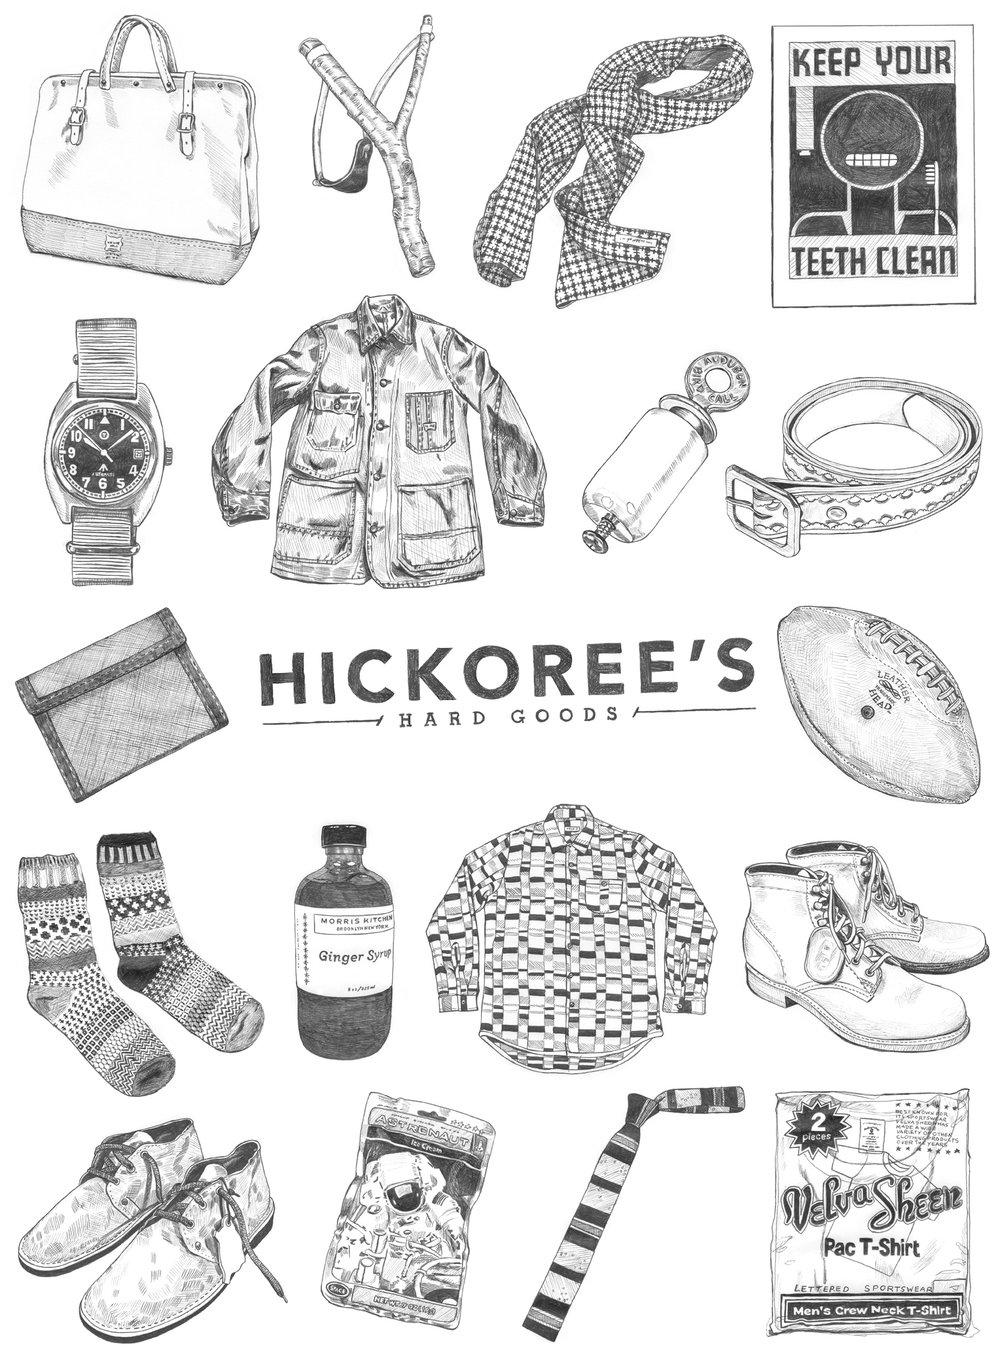 HickoreesPoster_FrontSide.jpg